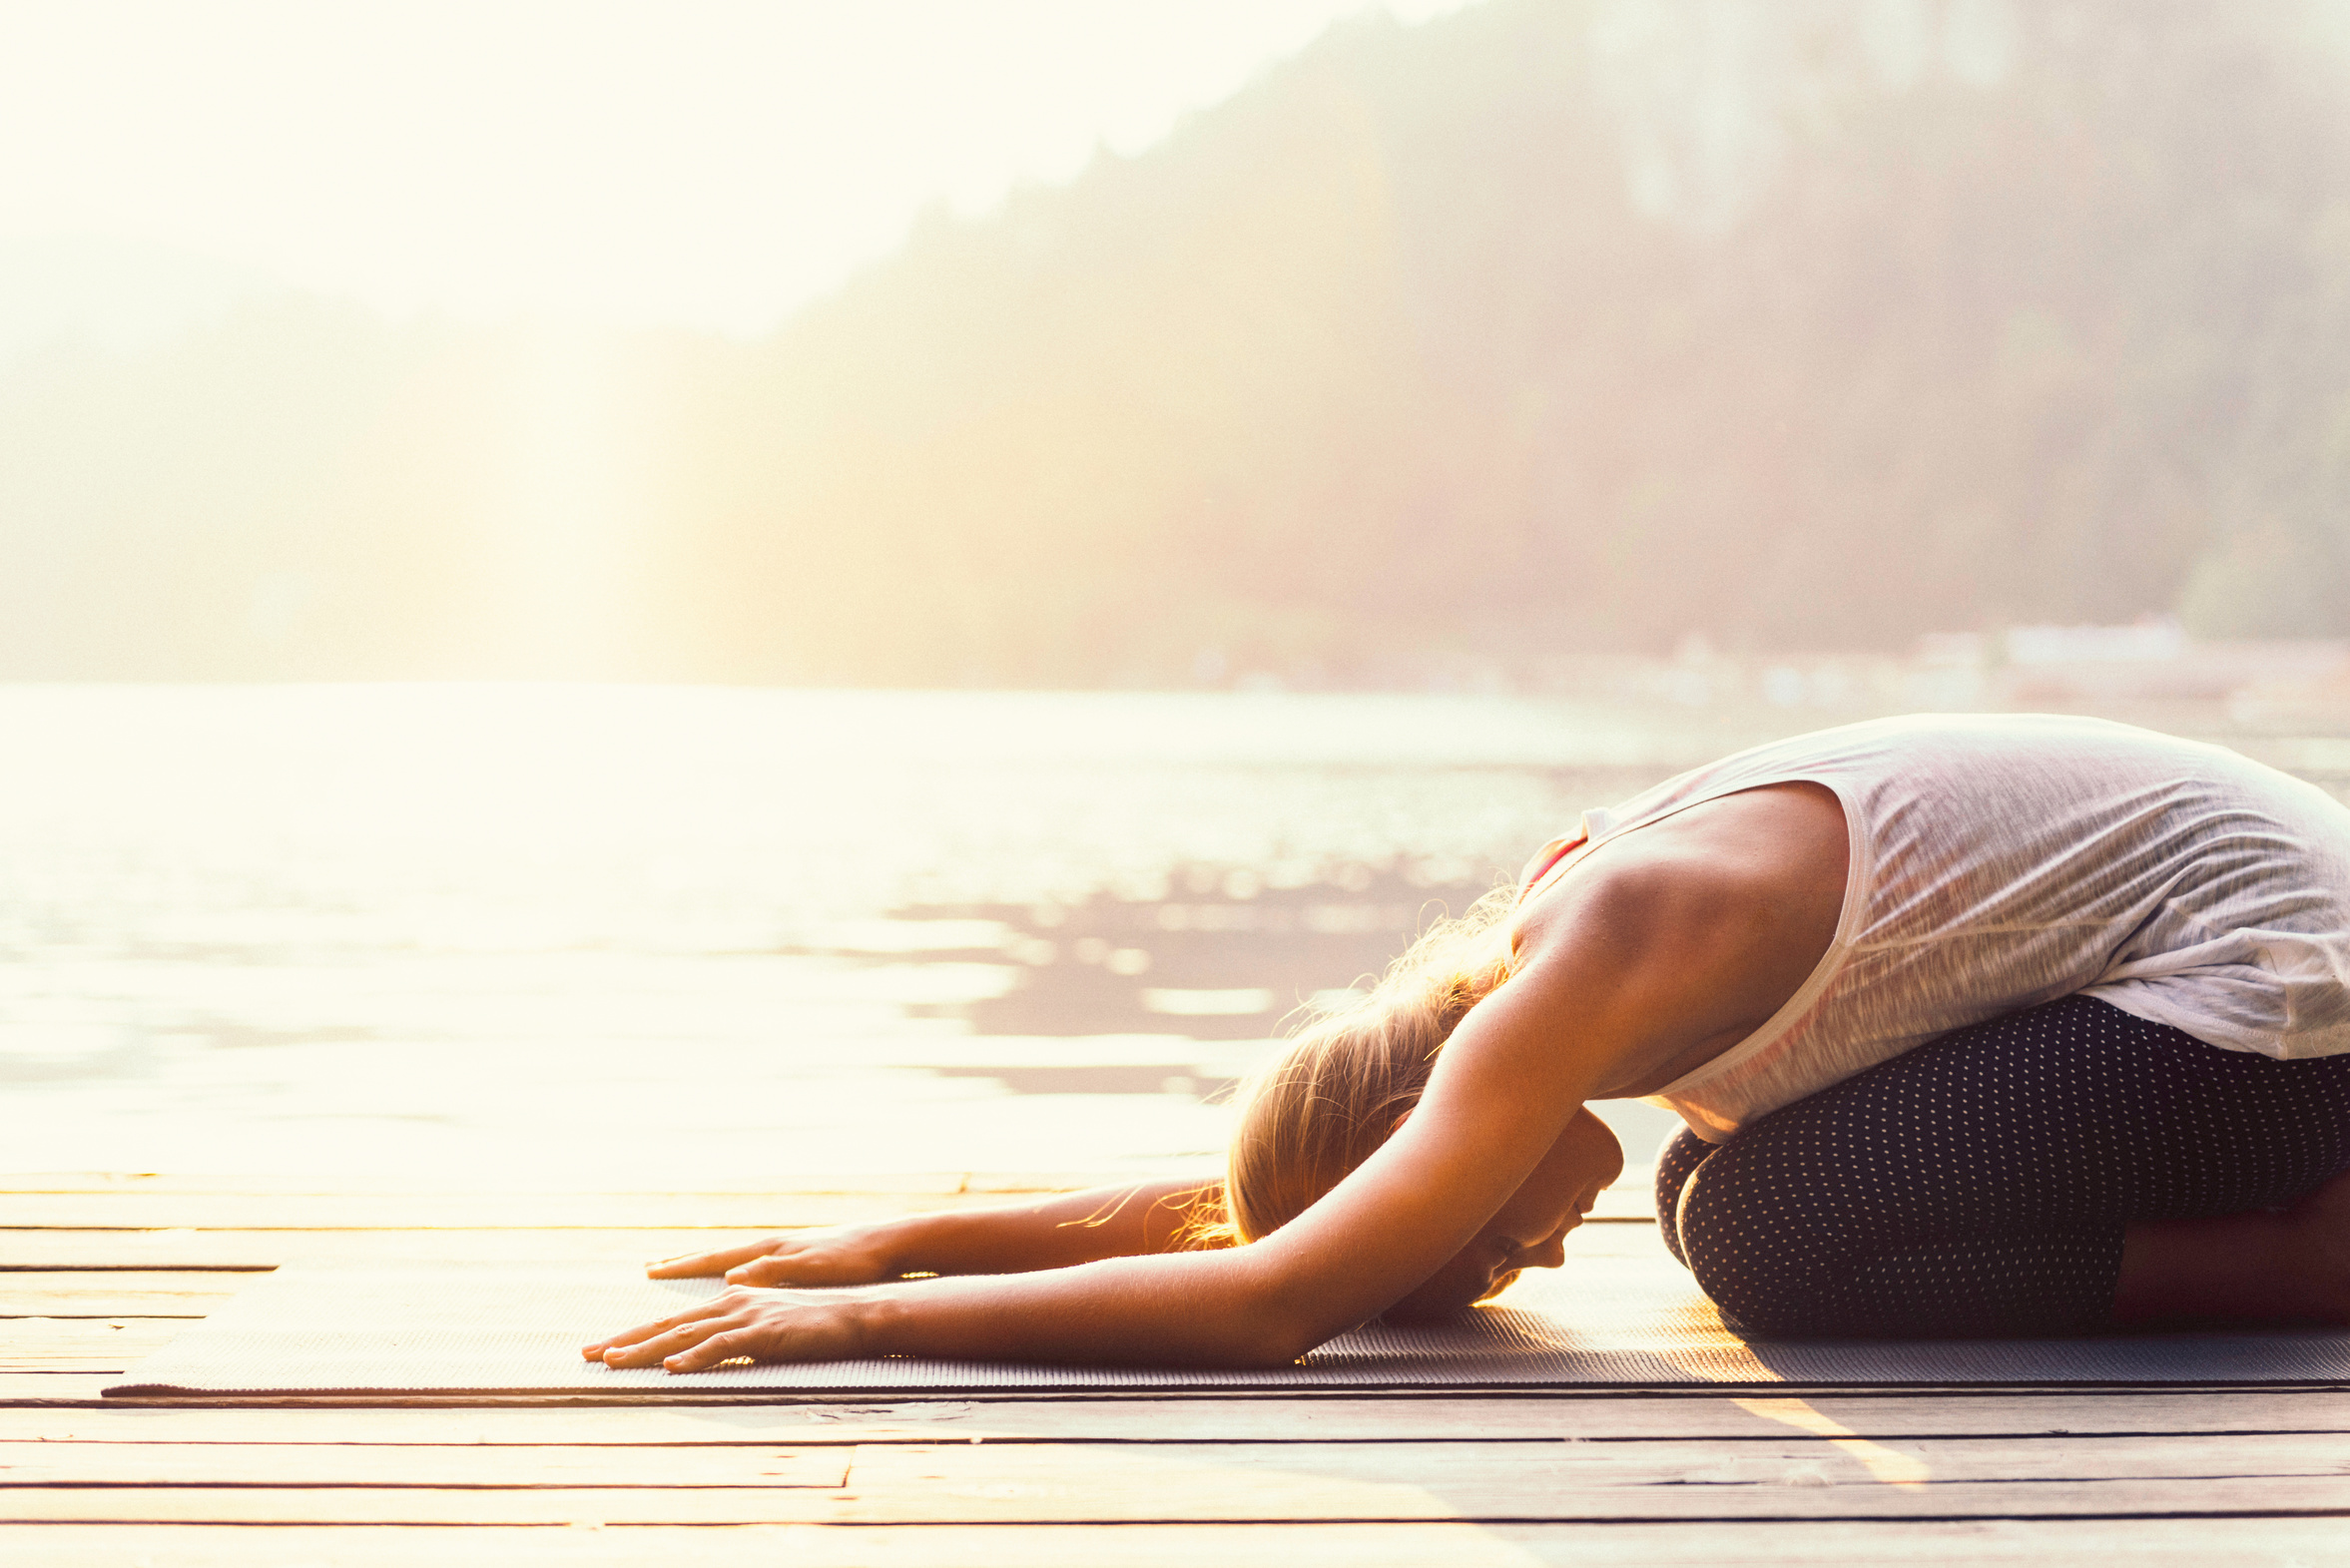 http://petraseipel.de/wp-content/uploads/2016/11/Yoga-und-Pilates-fotolia.jpg